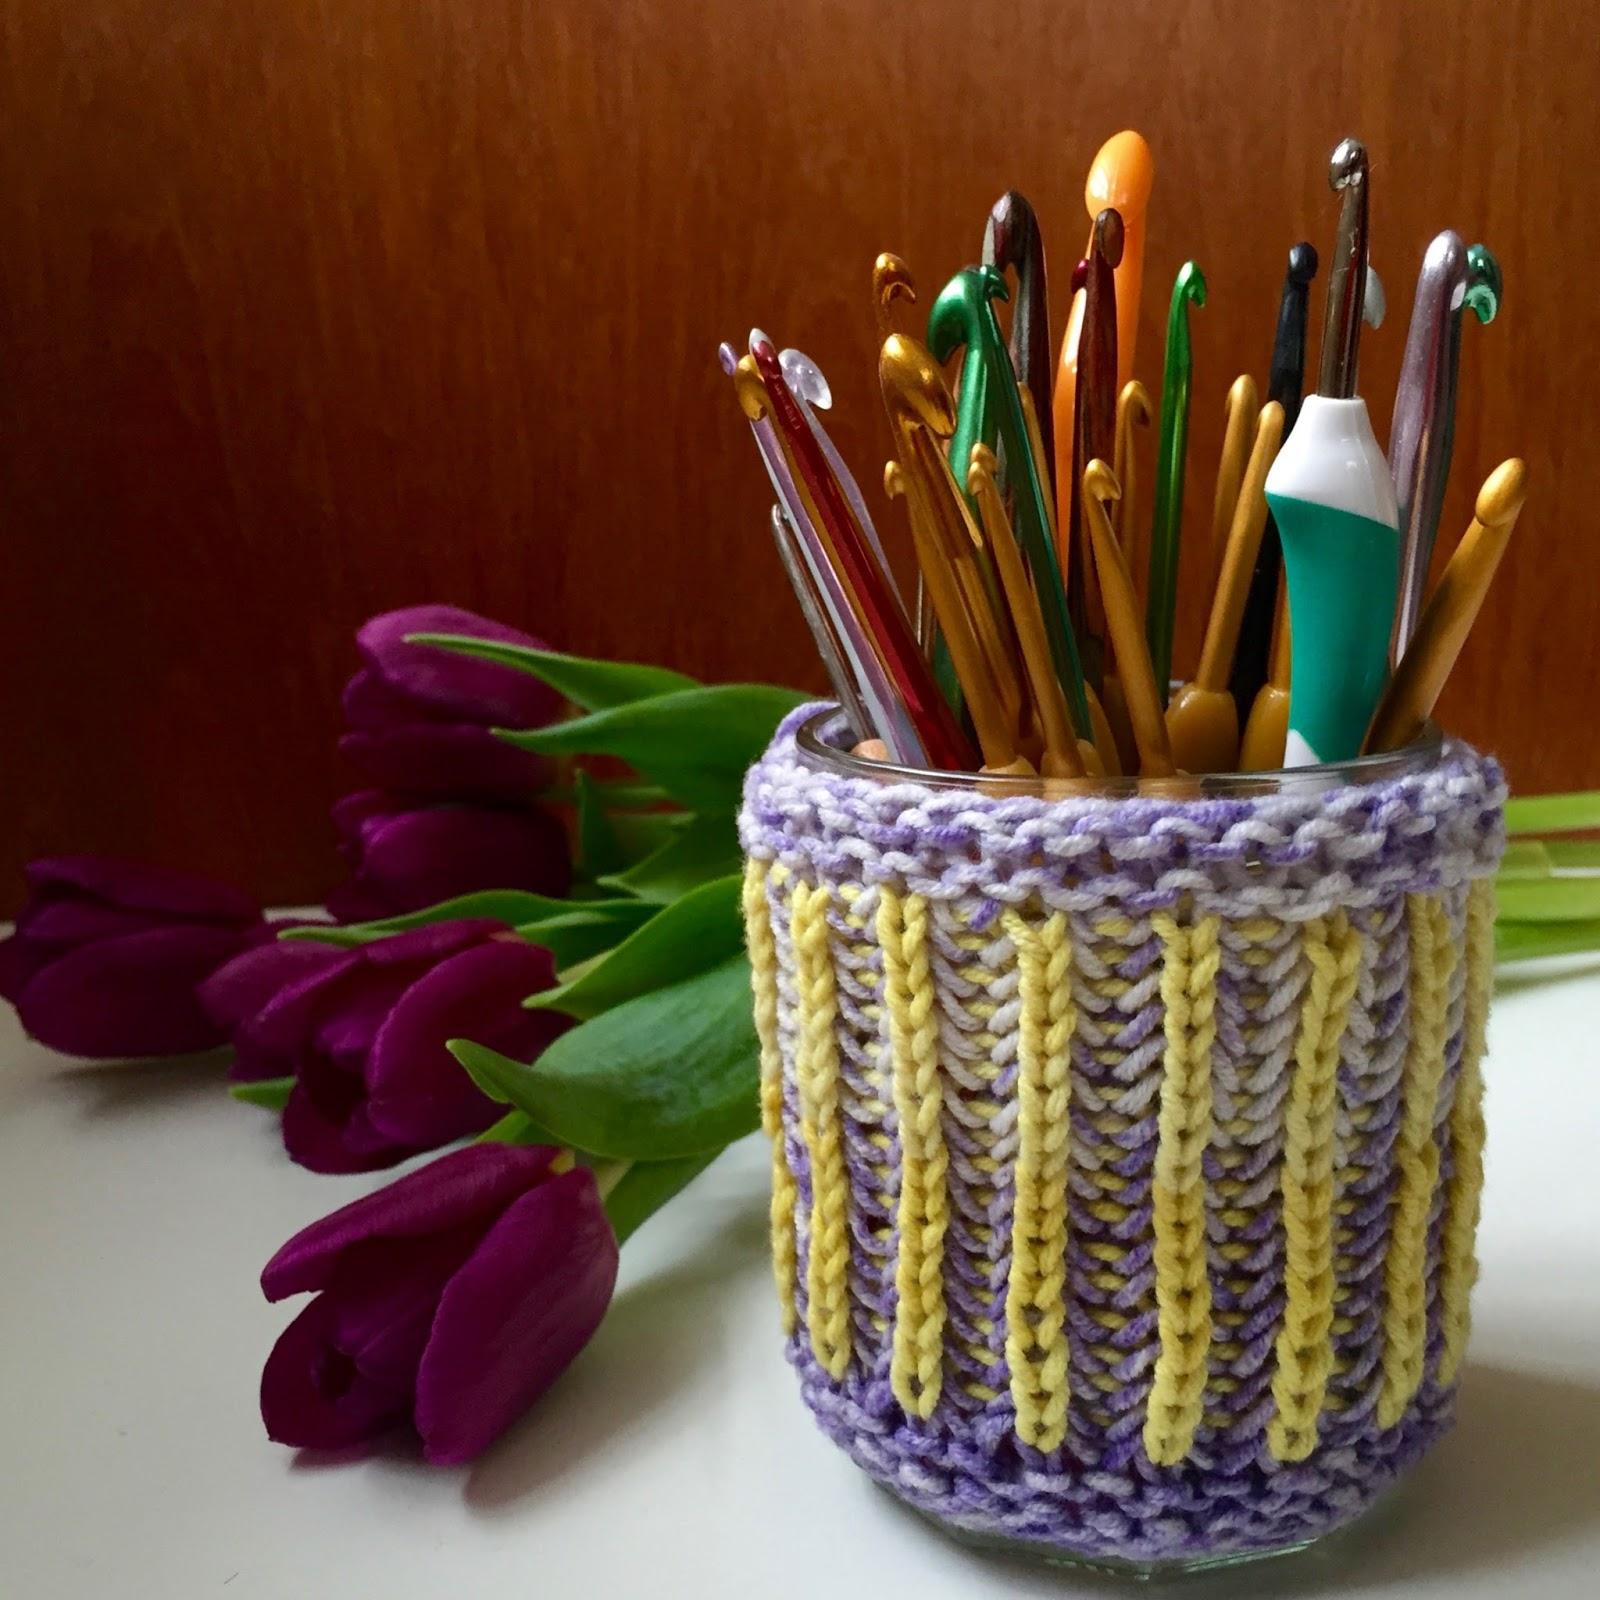 Brioche Knitting Part 3: Two-colour Brioche (in-the-round) | Crafts ...